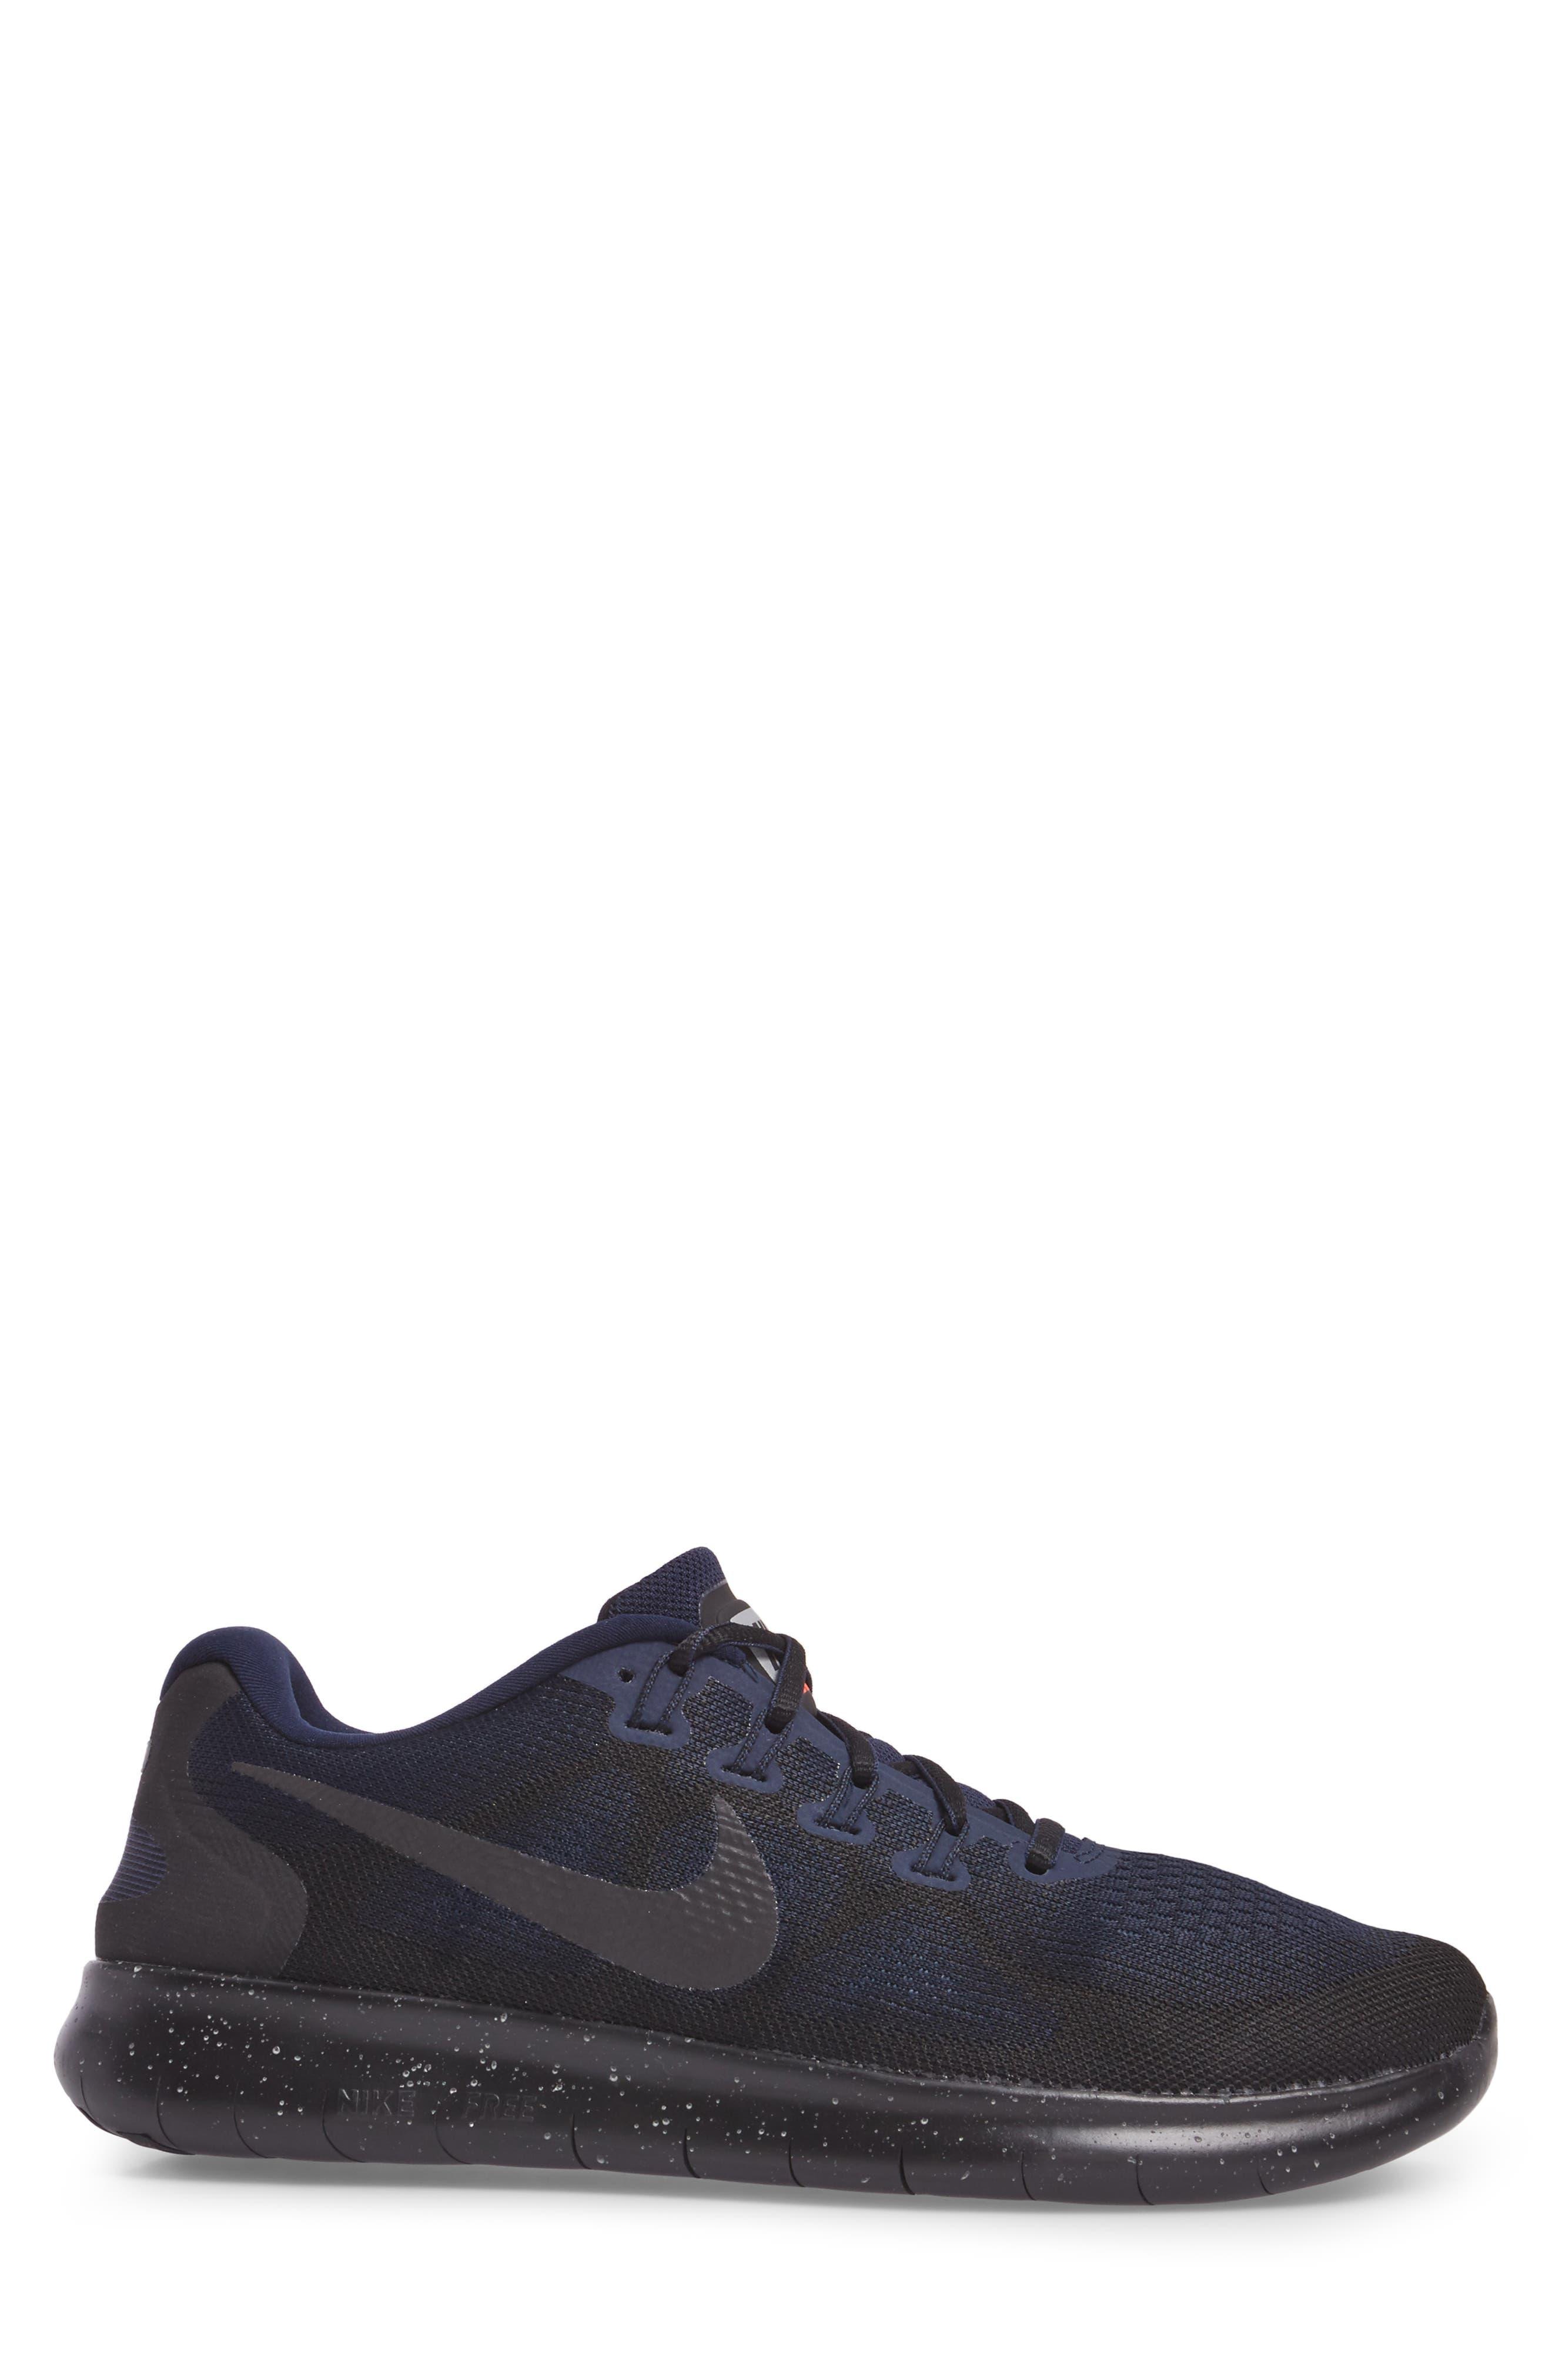 Alternate Image 3  - Nike Free RN 2017 Shield Water-Repellent Training Shoe (Men)